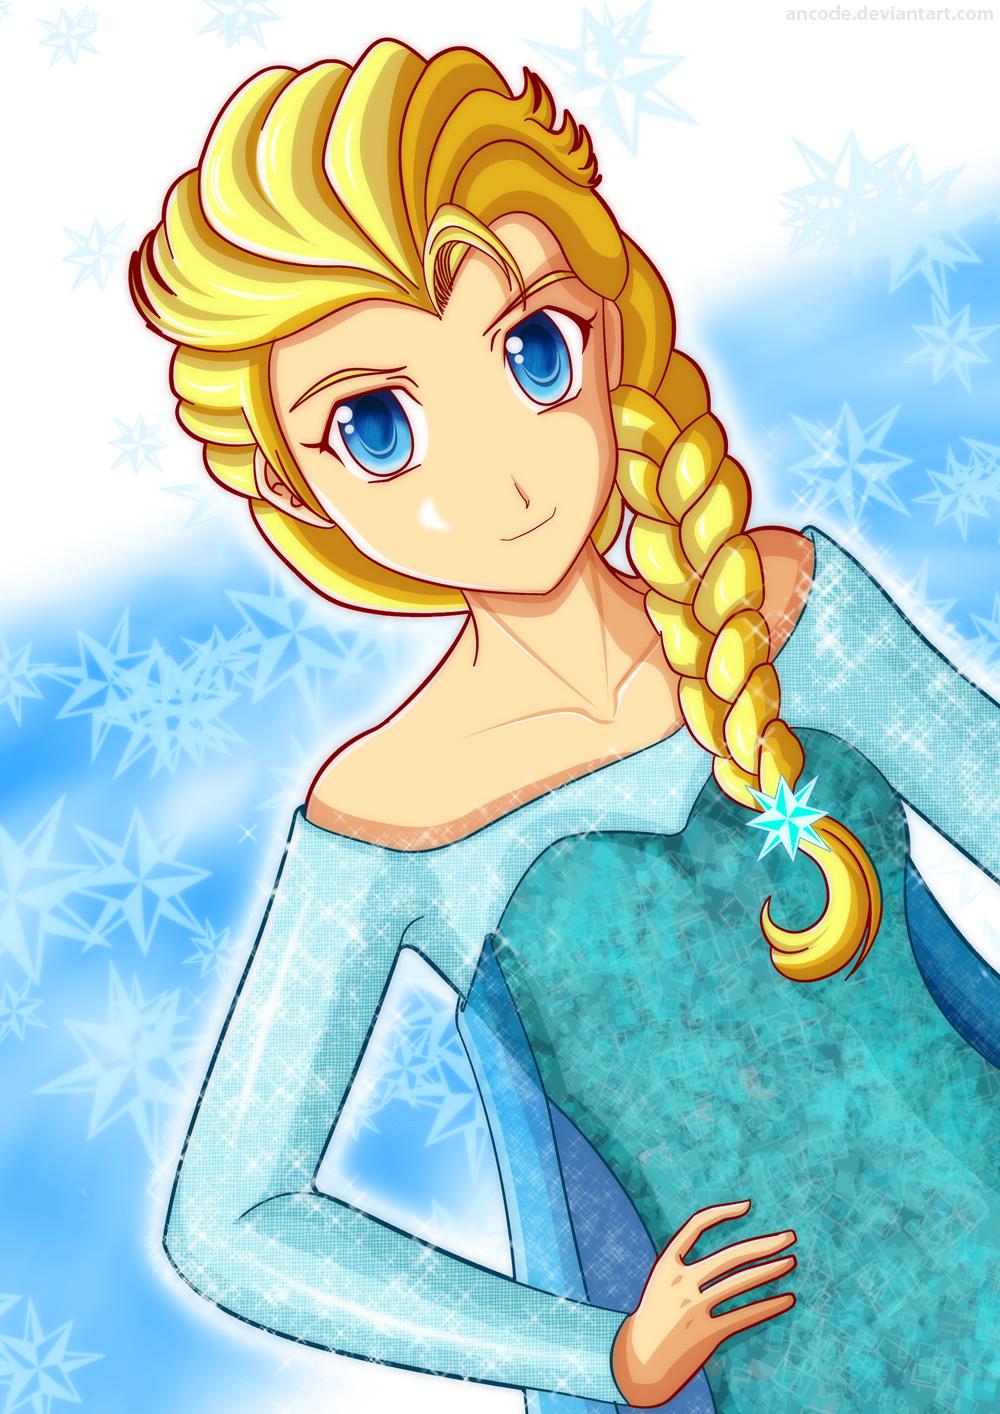 Frozen - Elsa by ancode